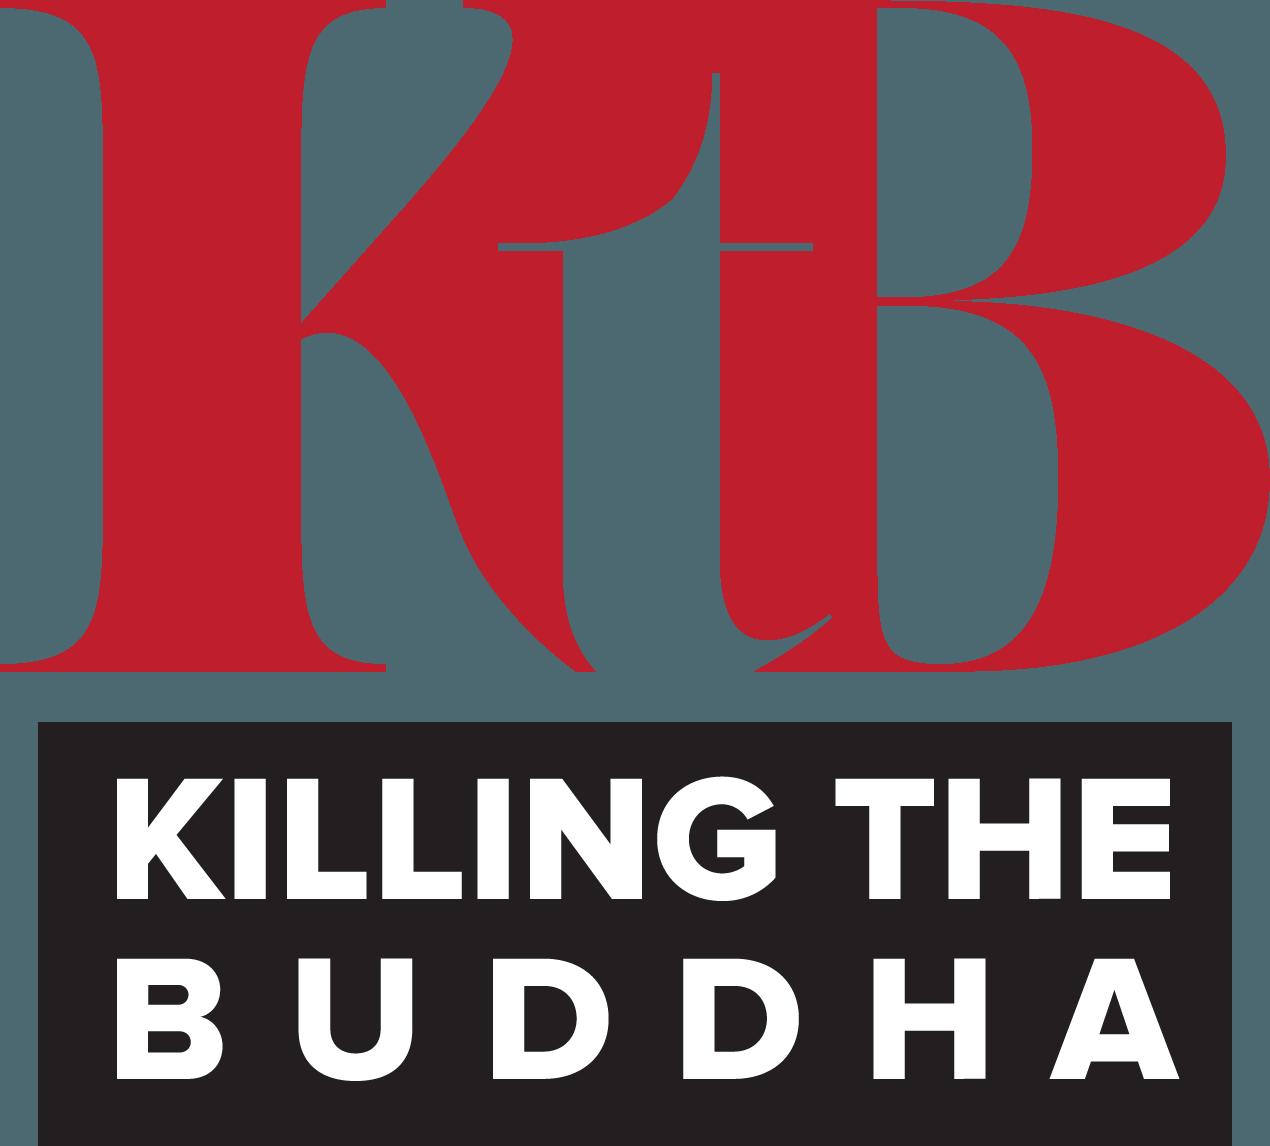 https://mk0sumydesignssu4248.kinstacdn.com/wp-content/uploads/2020/11/Killing-the-Buddha@3x-8.png